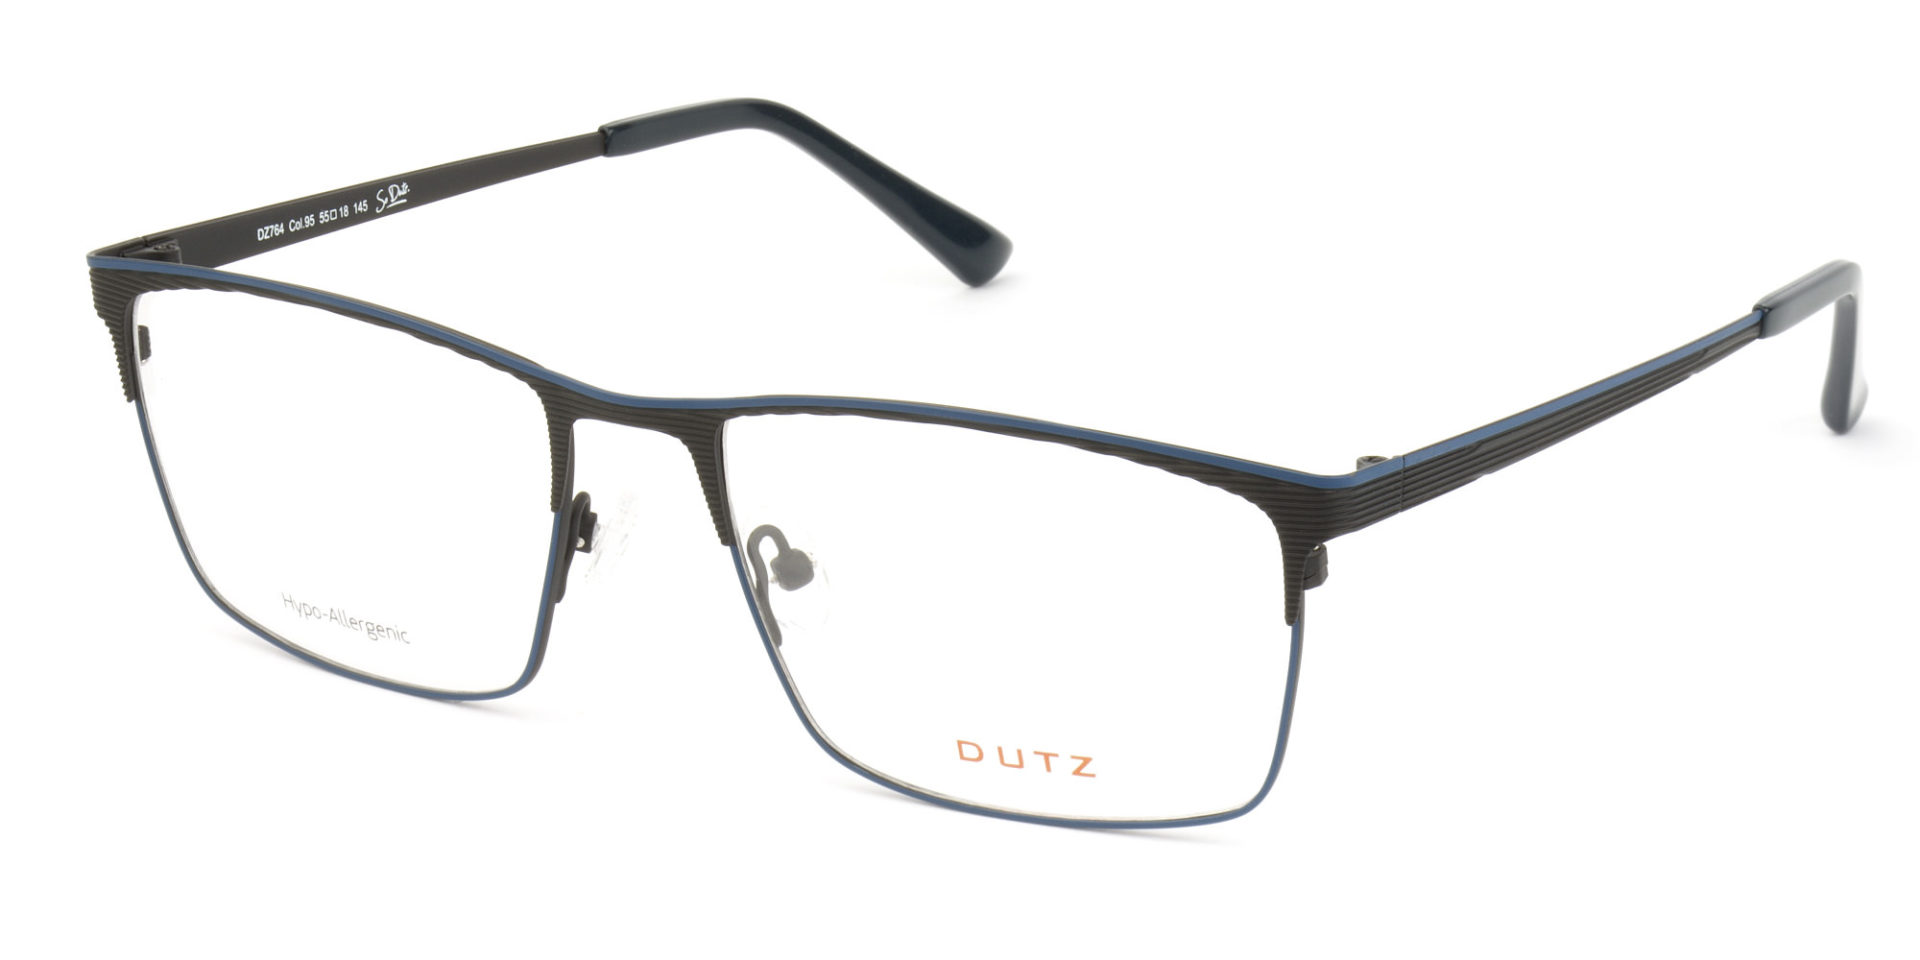 DZ764-95